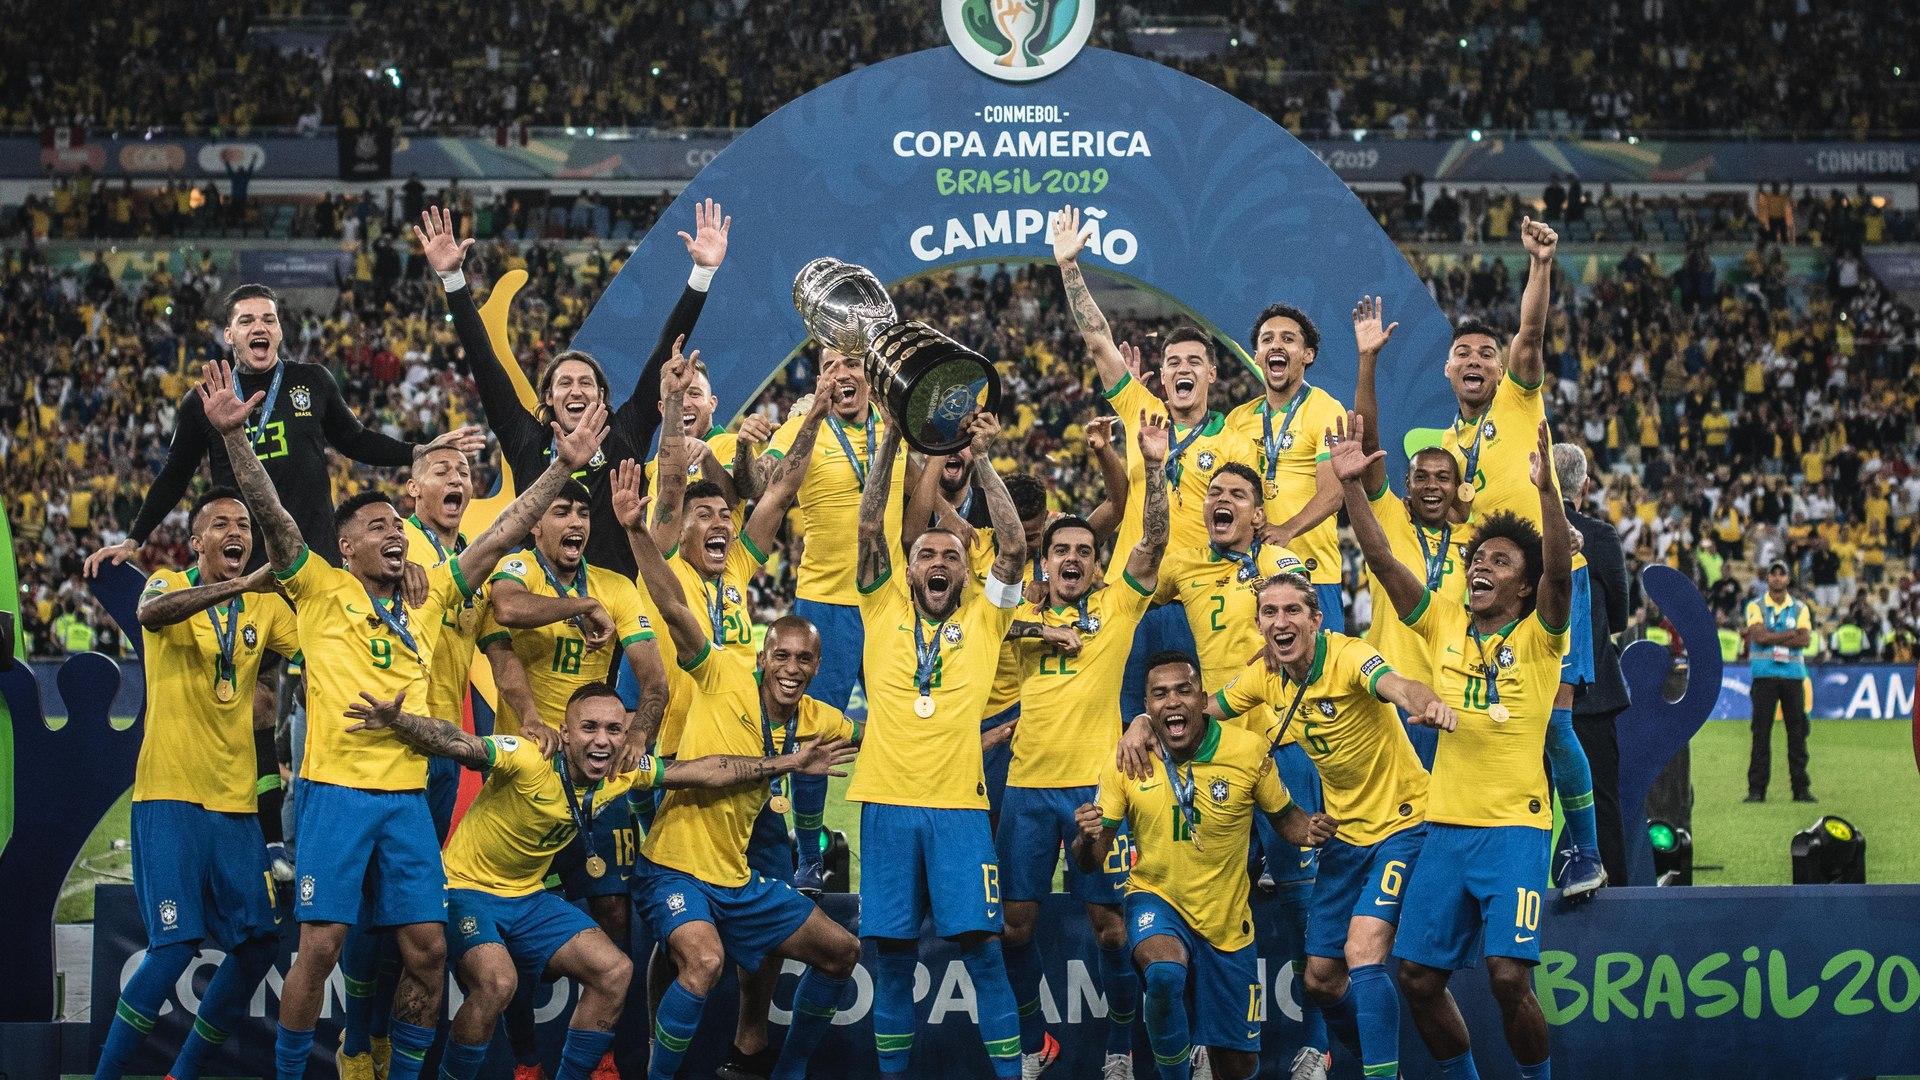 Saiba curiosidades sobre a Copa América 2020